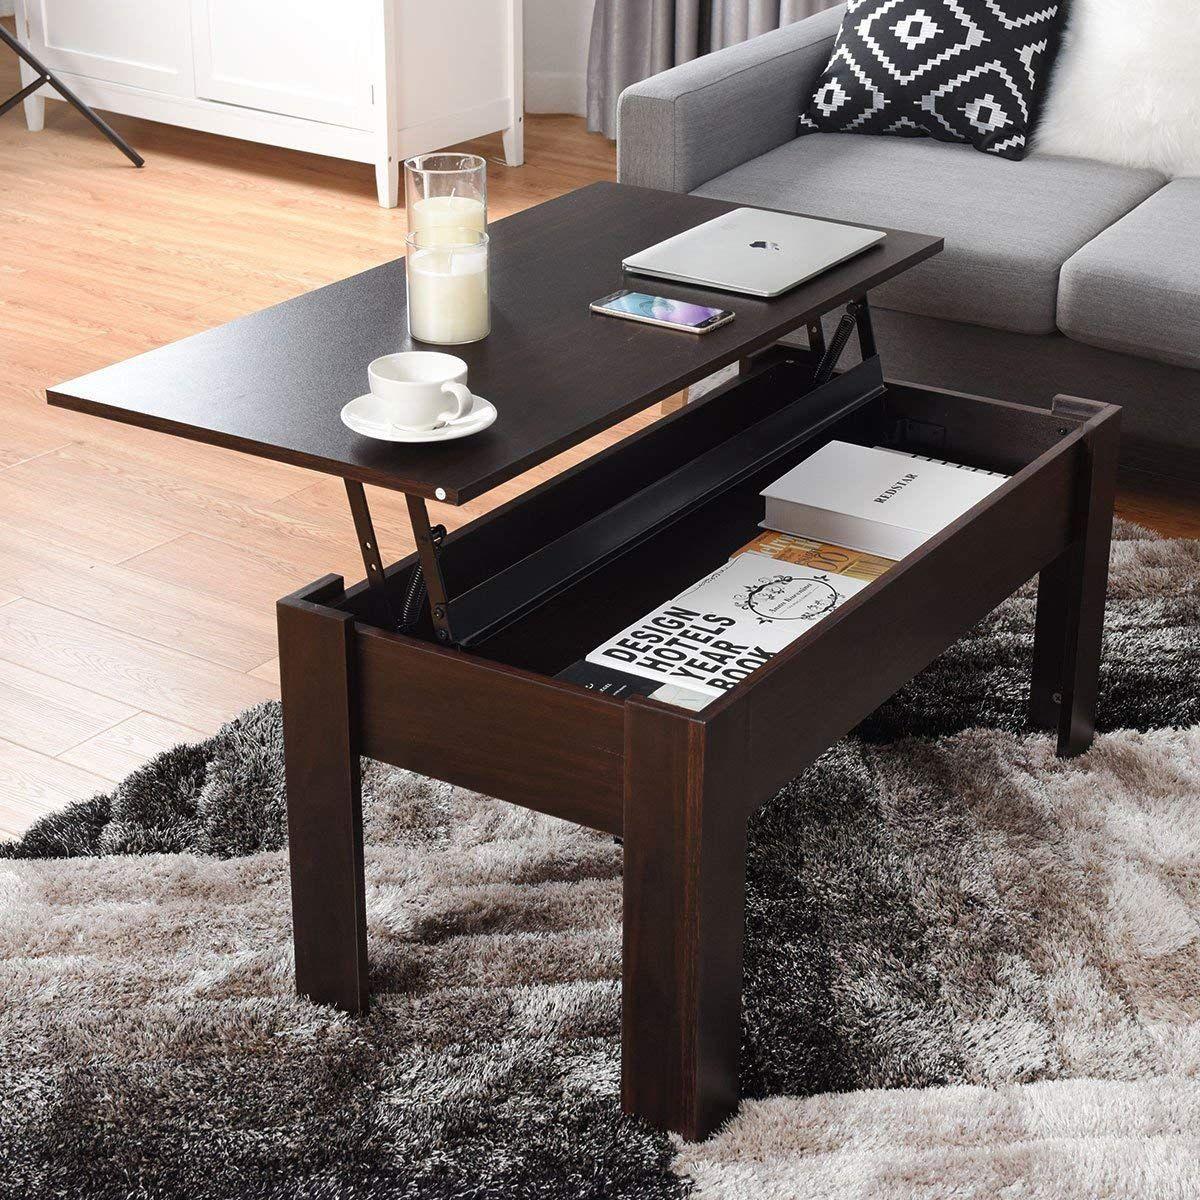 Amazon Com Tangkula Coffee Table Lift Top Wood Home Living Room Modern Lift Top Storage Coffee Table W Hidden Comp Coffee Table Home Furniture Cheap Furniture [ 1200 x 1200 Pixel ]